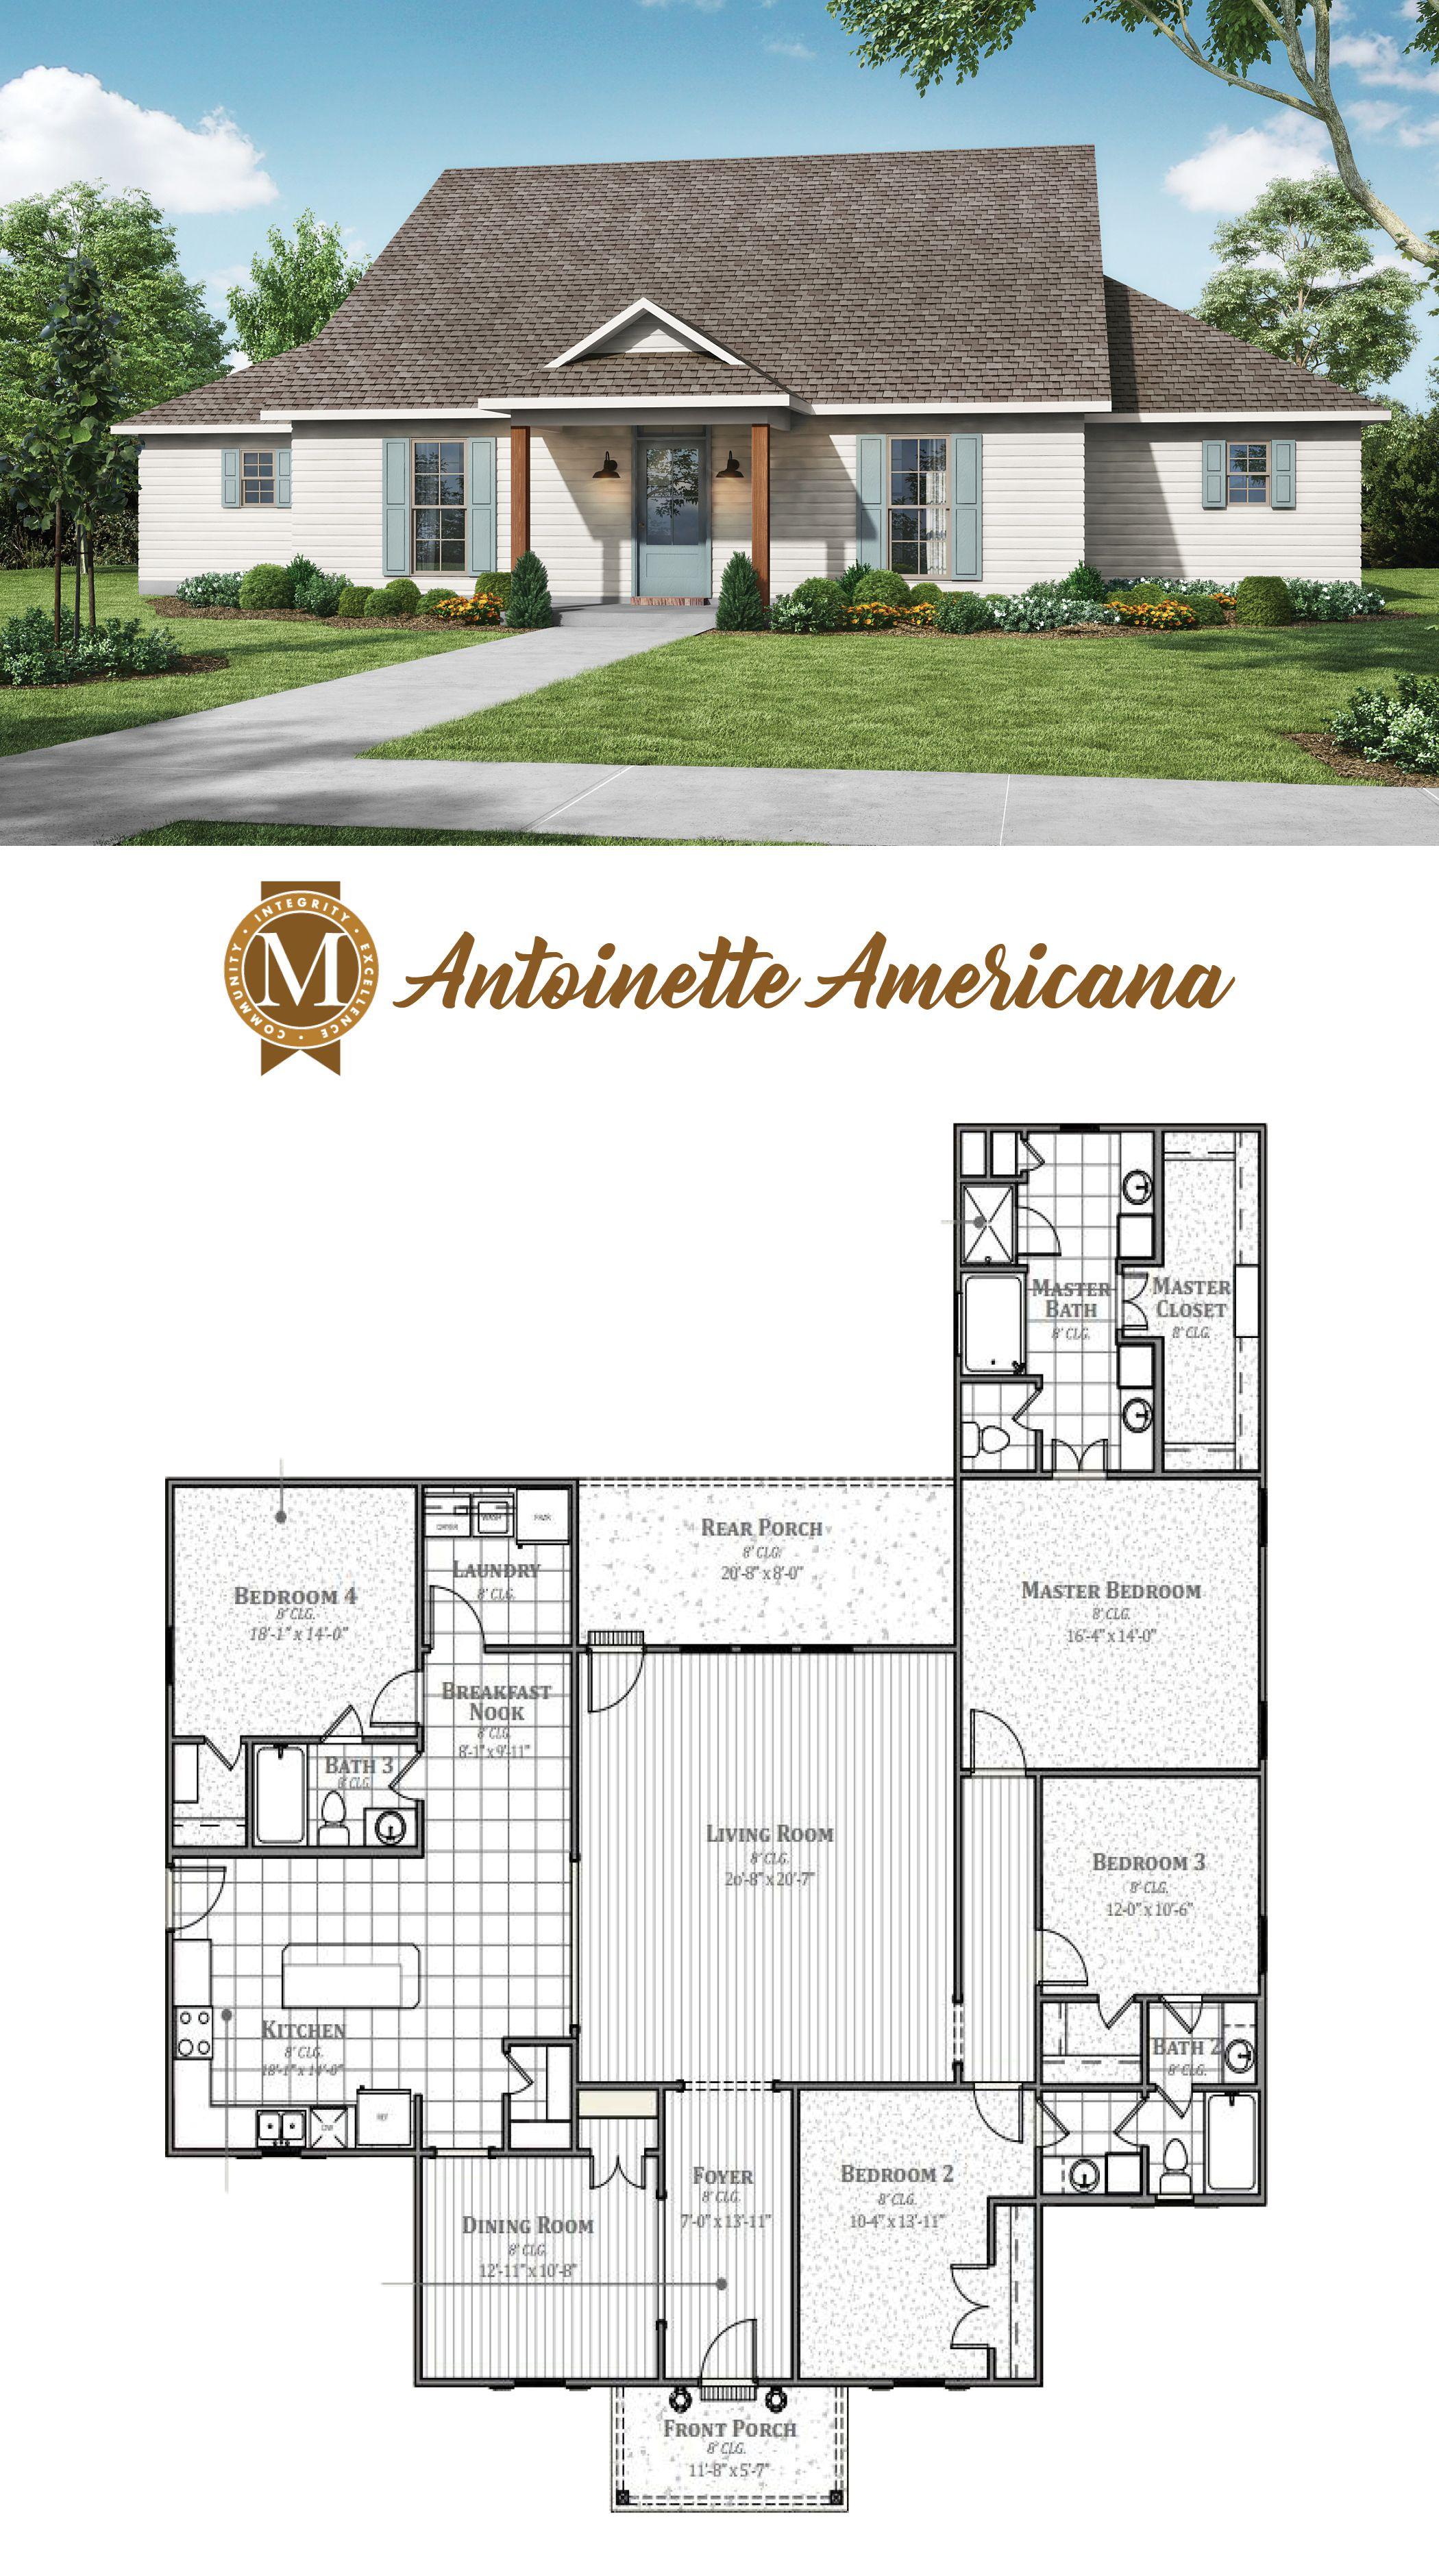 Antoinette Americana My House Plans Craftsman House Plans House Plans